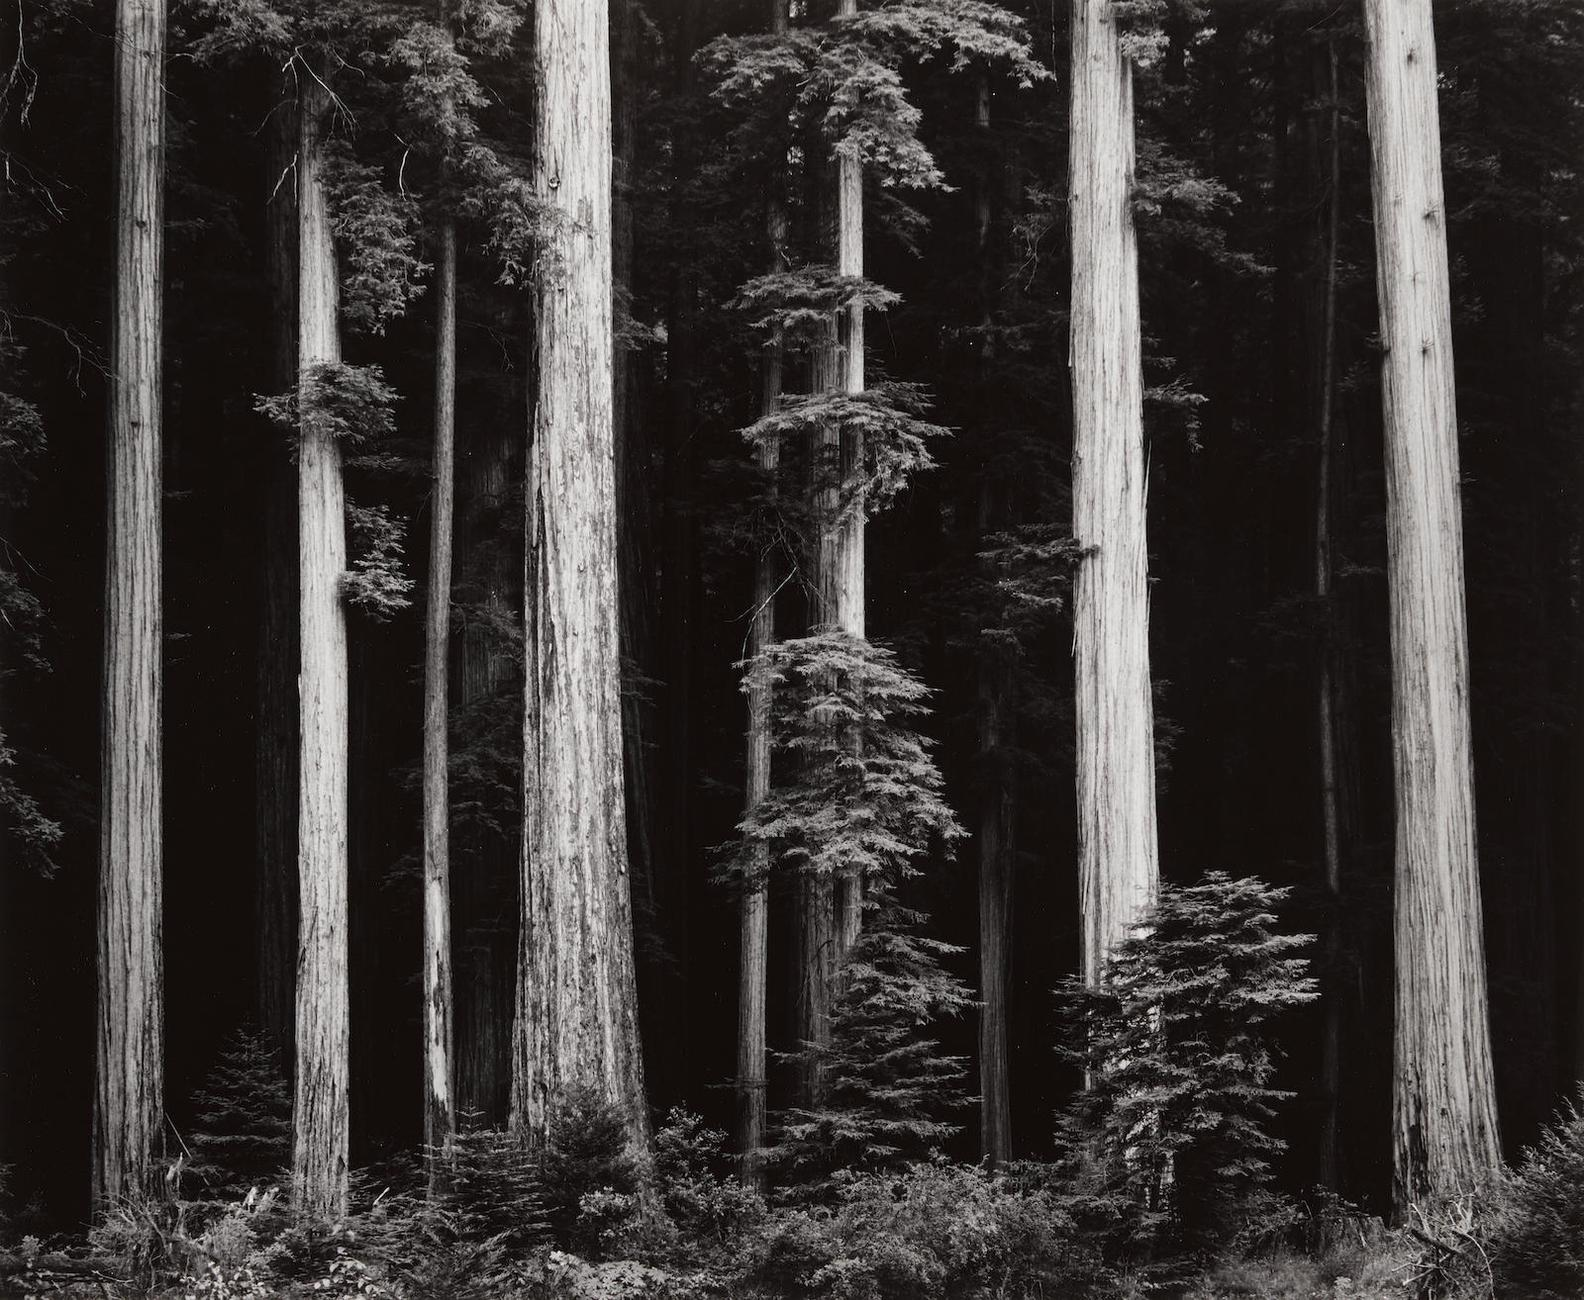 Ansel Adams-Northern California Coast Redwoods, From Portfolio IV-1960